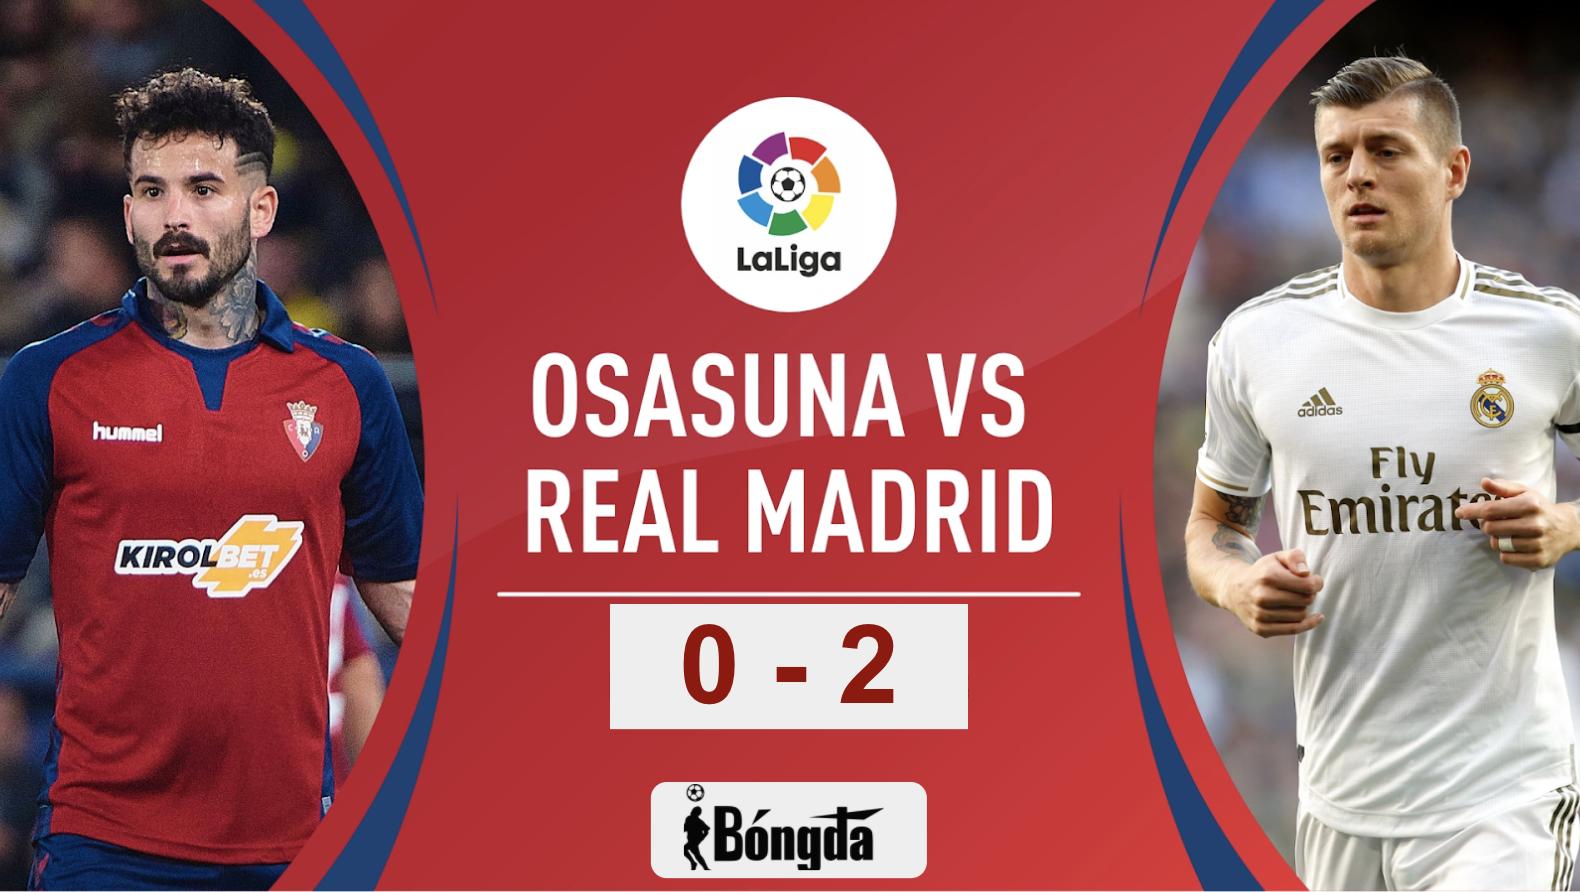 Real Madrid 2-0 Osasuna: Militao và Casemiro giúp Real Madrid vượt qua Osasuna